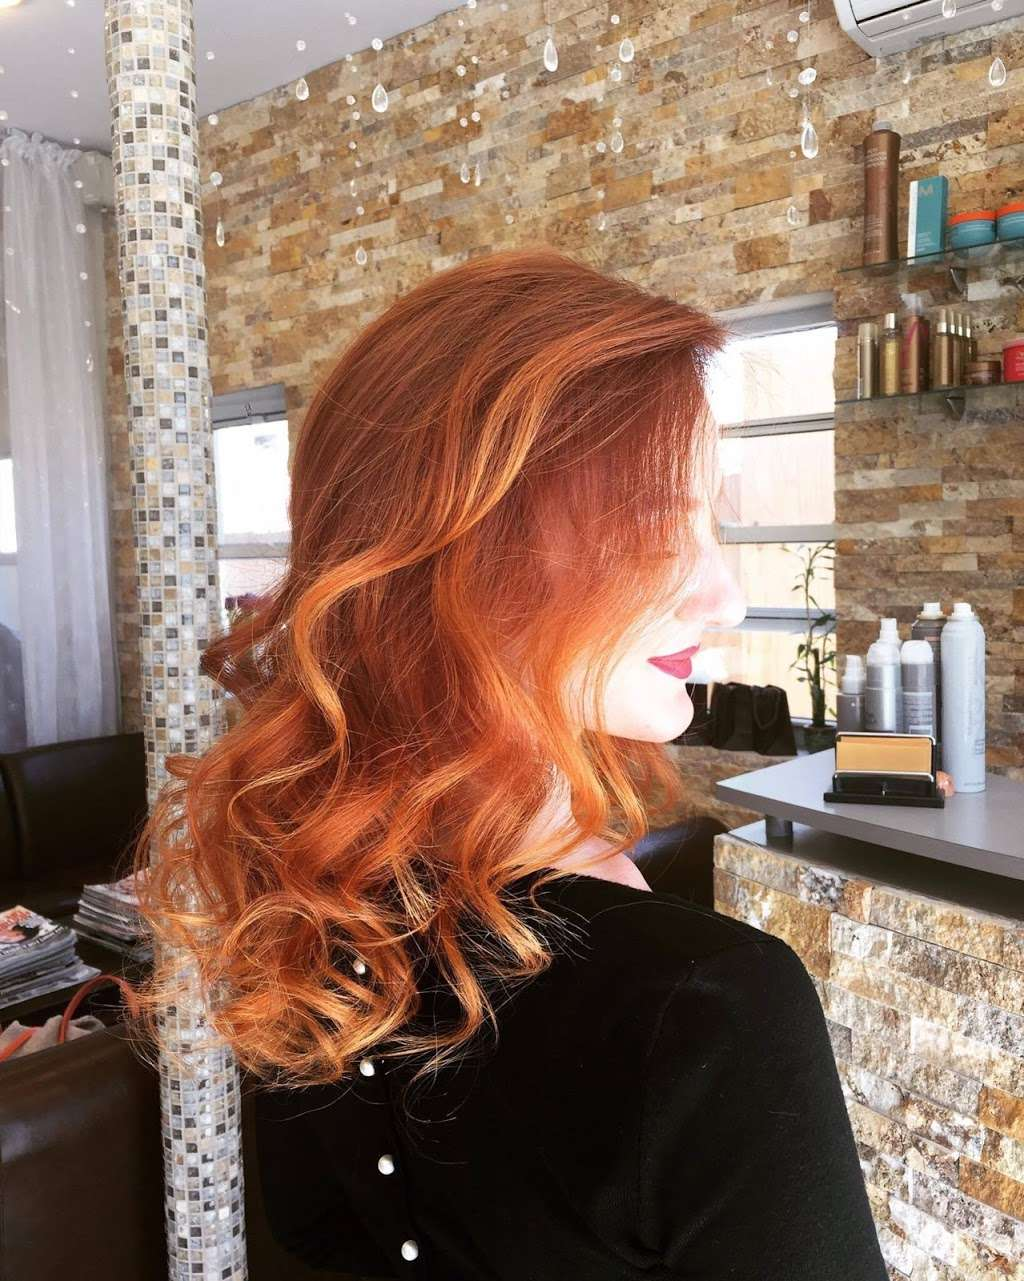 Salon Evolution LLC - hair care  | Photo 4 of 10 | Address: 3075 Emmons Ave, Brooklyn, NY 11235, USA | Phone: (718) 332-5135